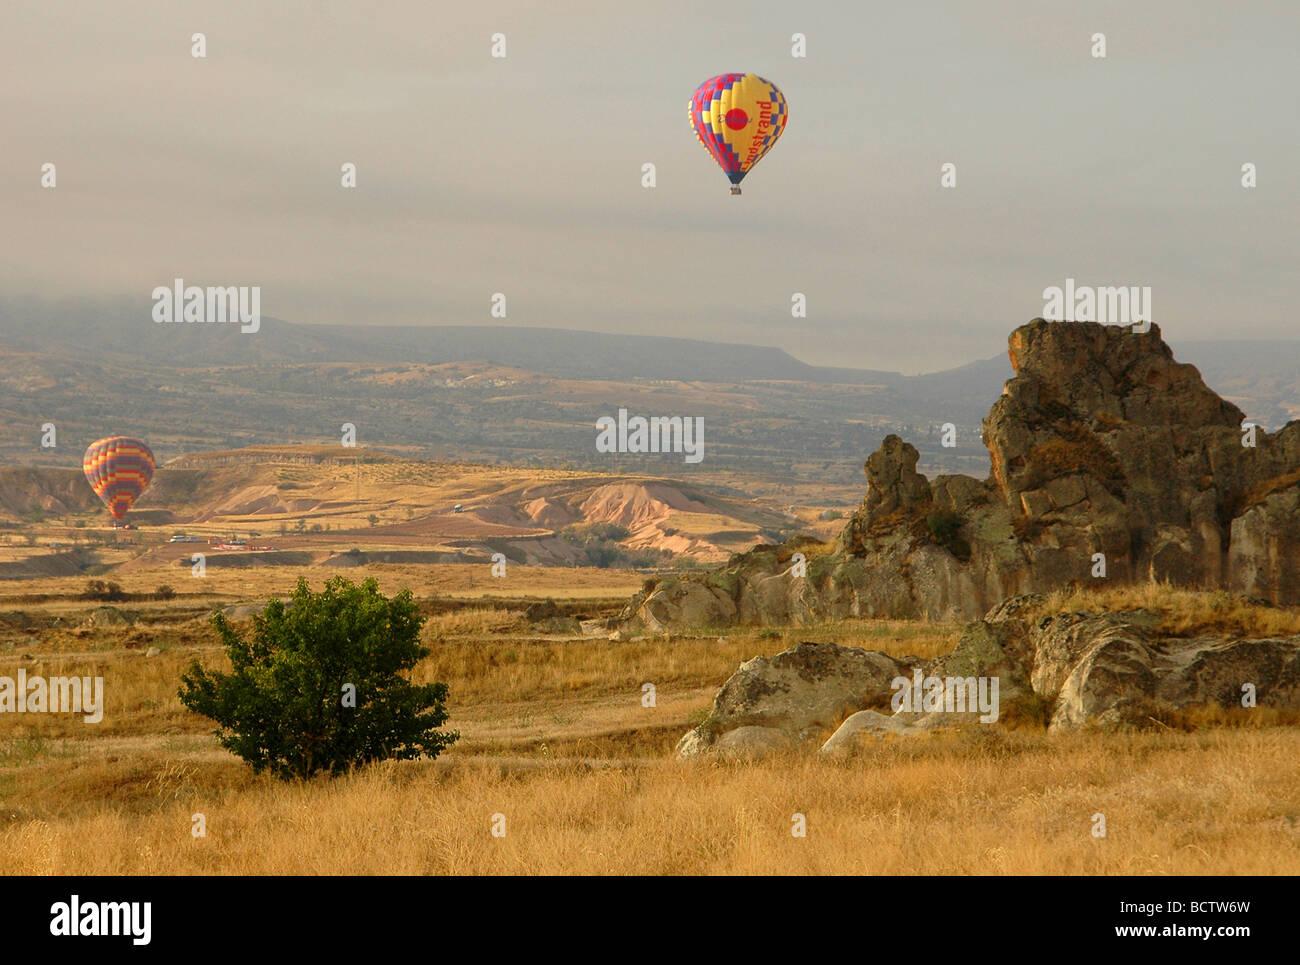 hot air baloon in cappadocia center of Turkey - Stock Image